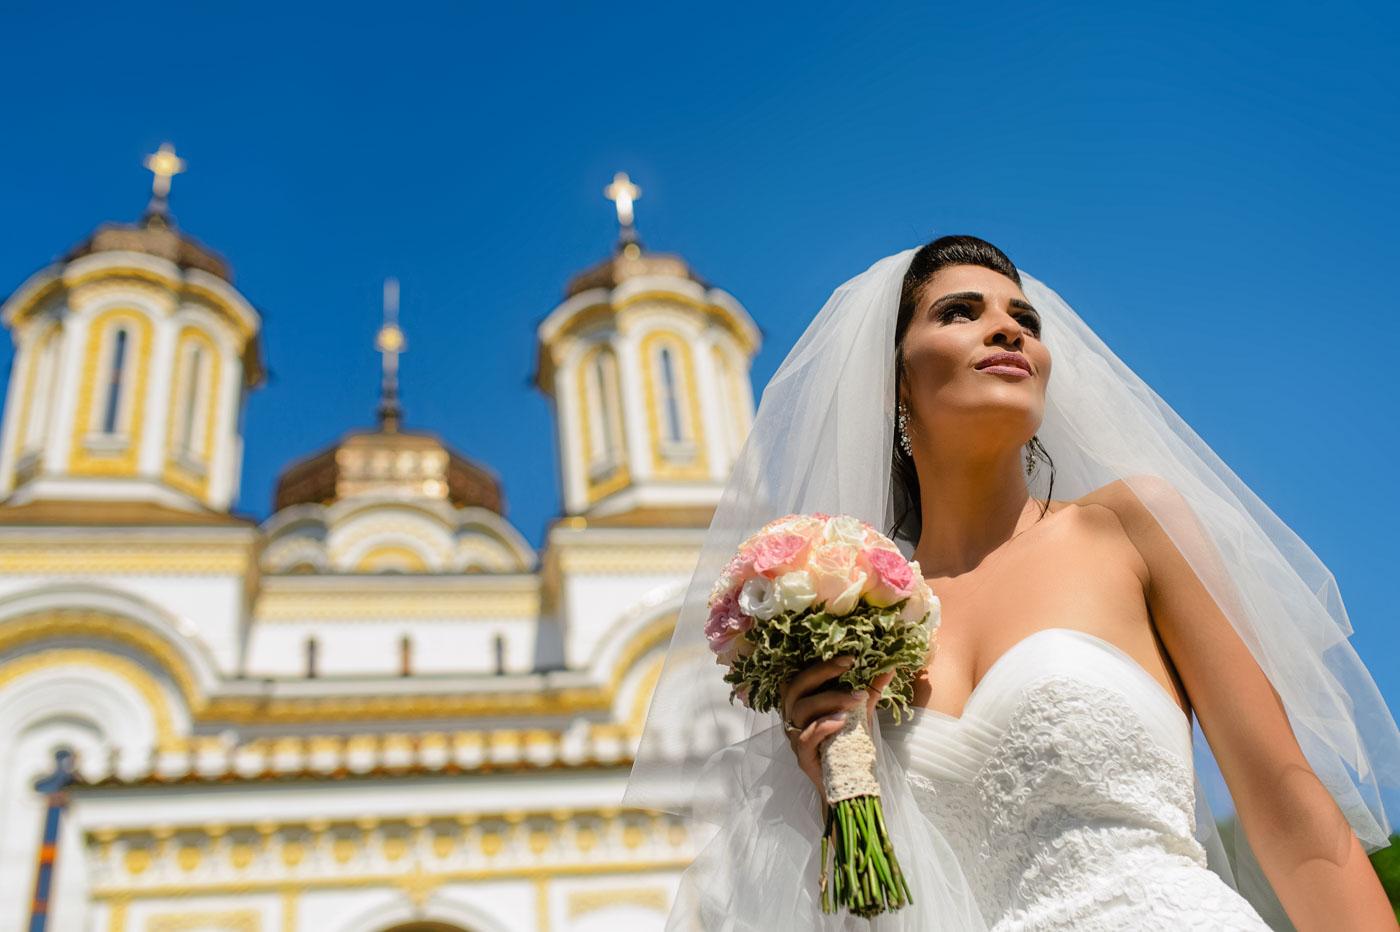 Alex Barbu fotograf nunta Pitesti - Bucuresti - mireasa frumoasa inainte de biserica